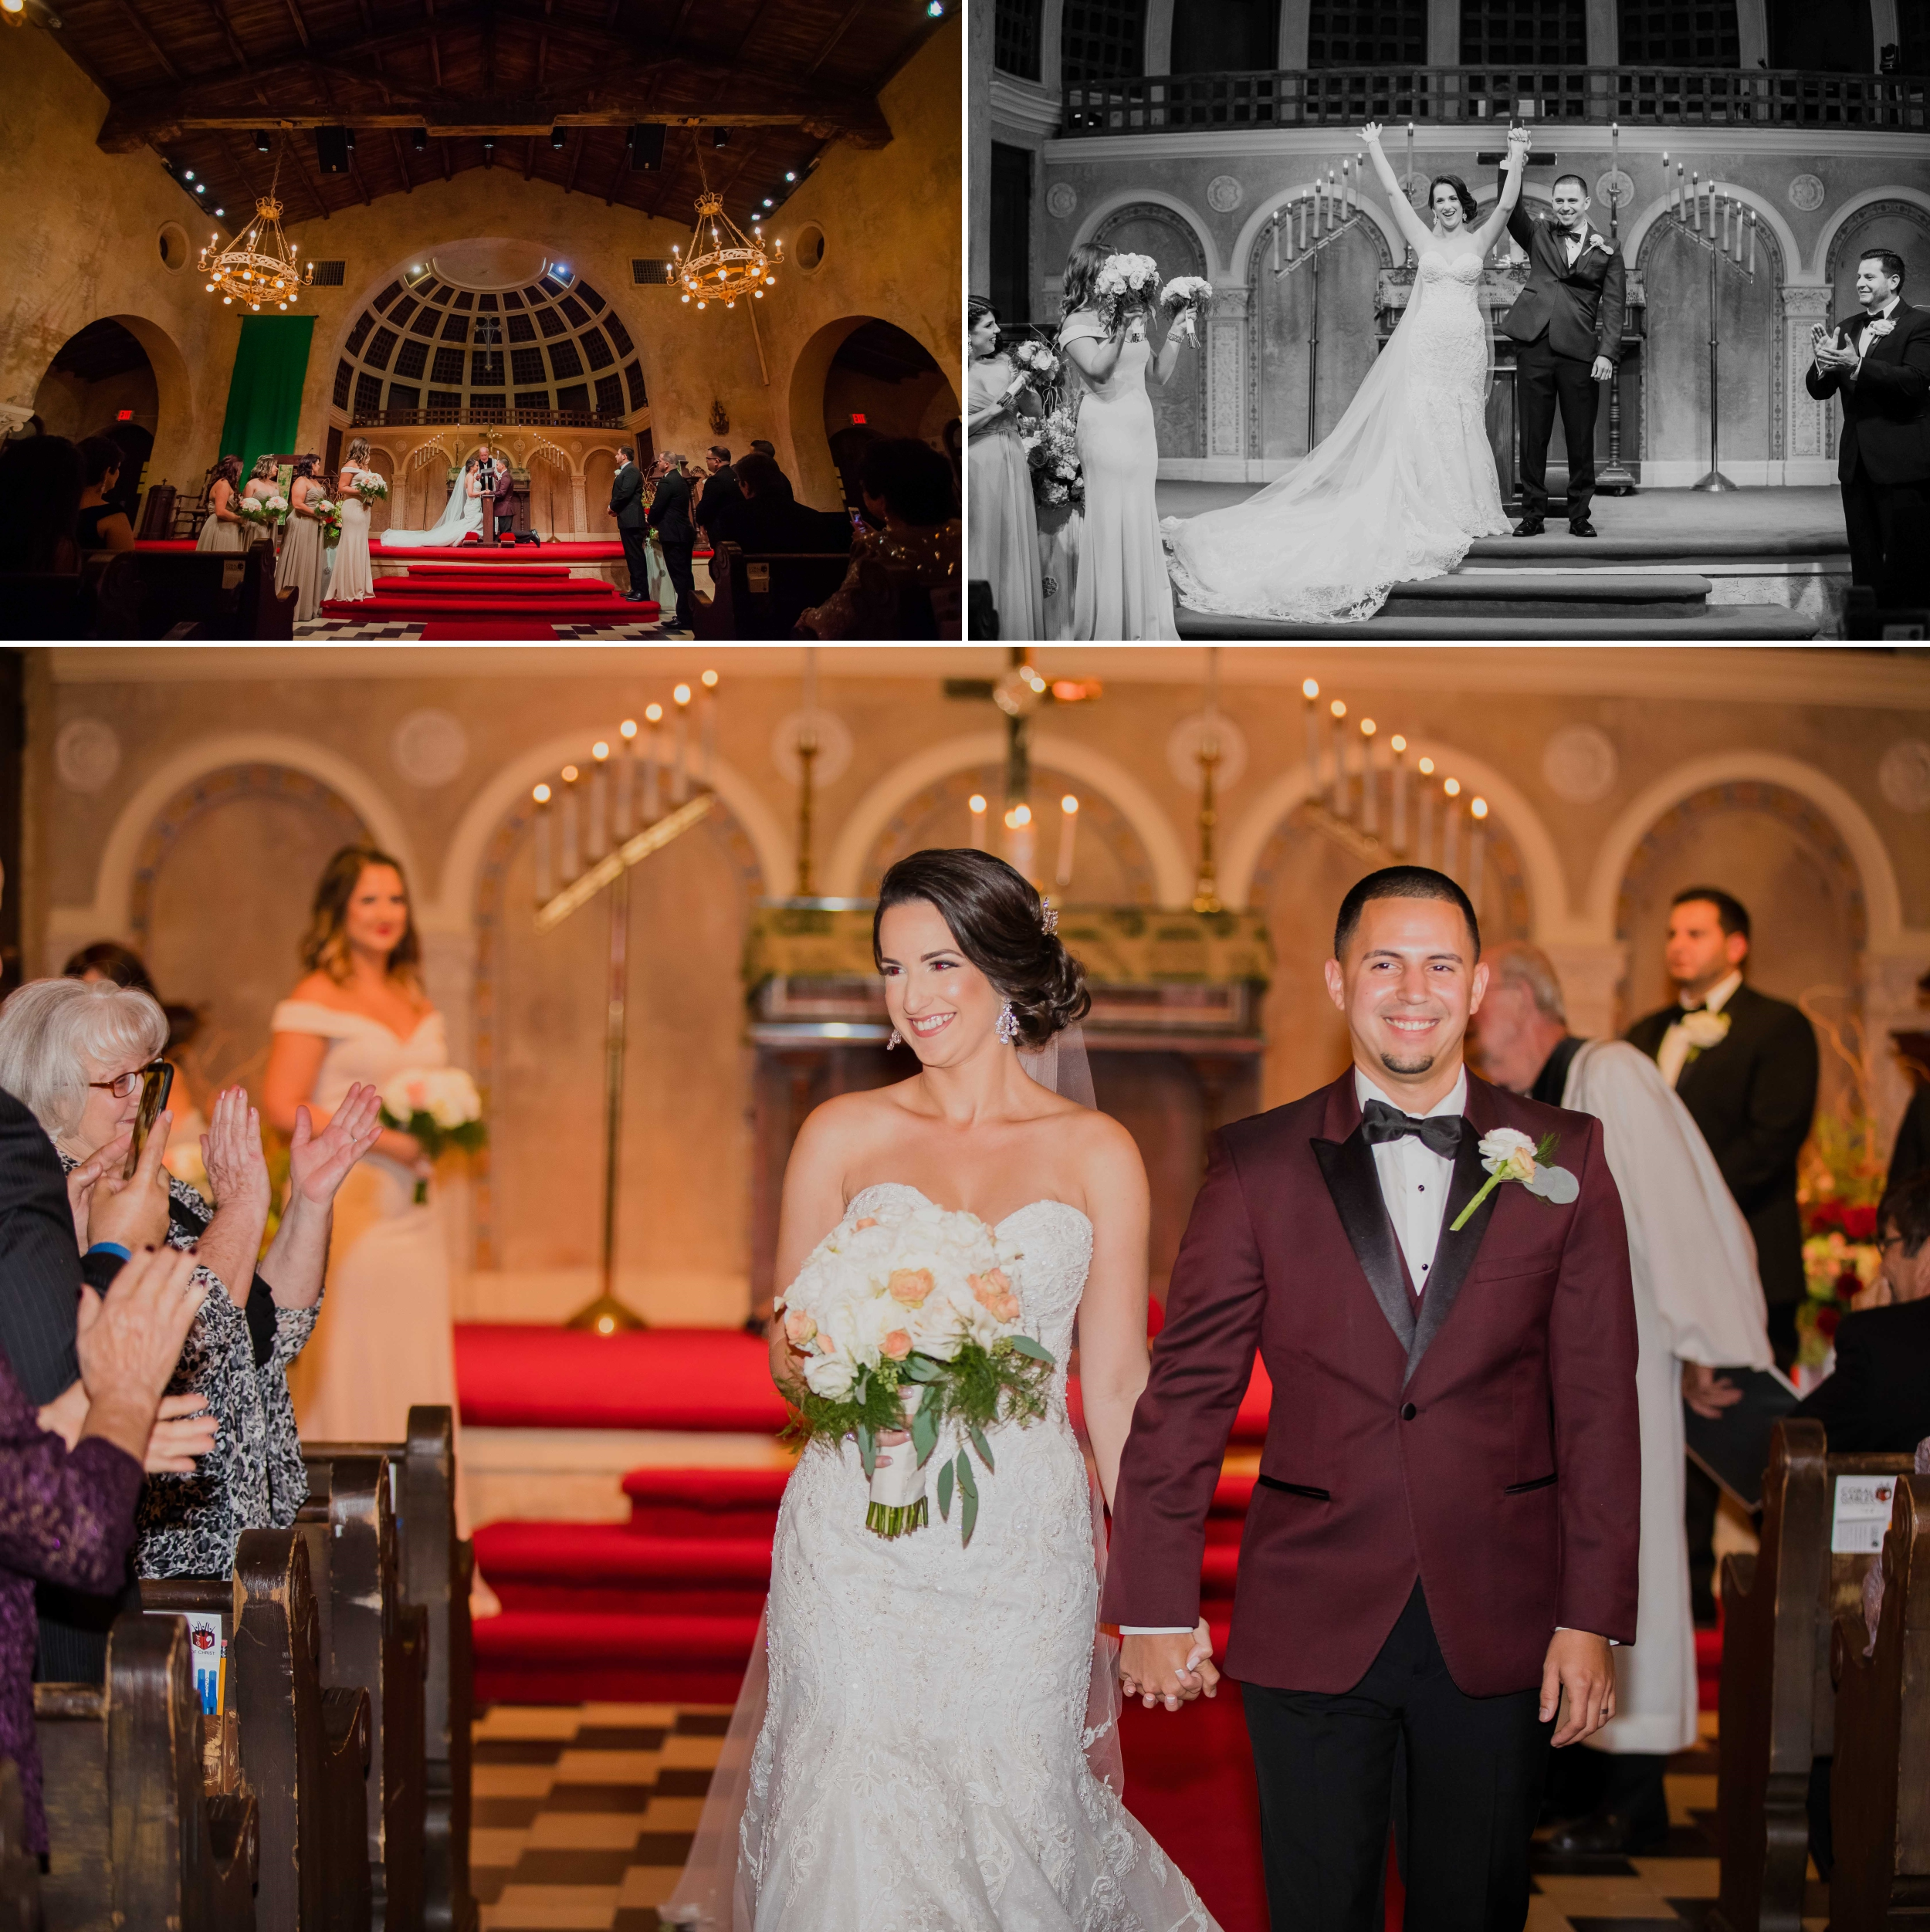 Wedding - Coco Plum - Coral Gables Congregational - Santy Martinez Photography 23.jpg